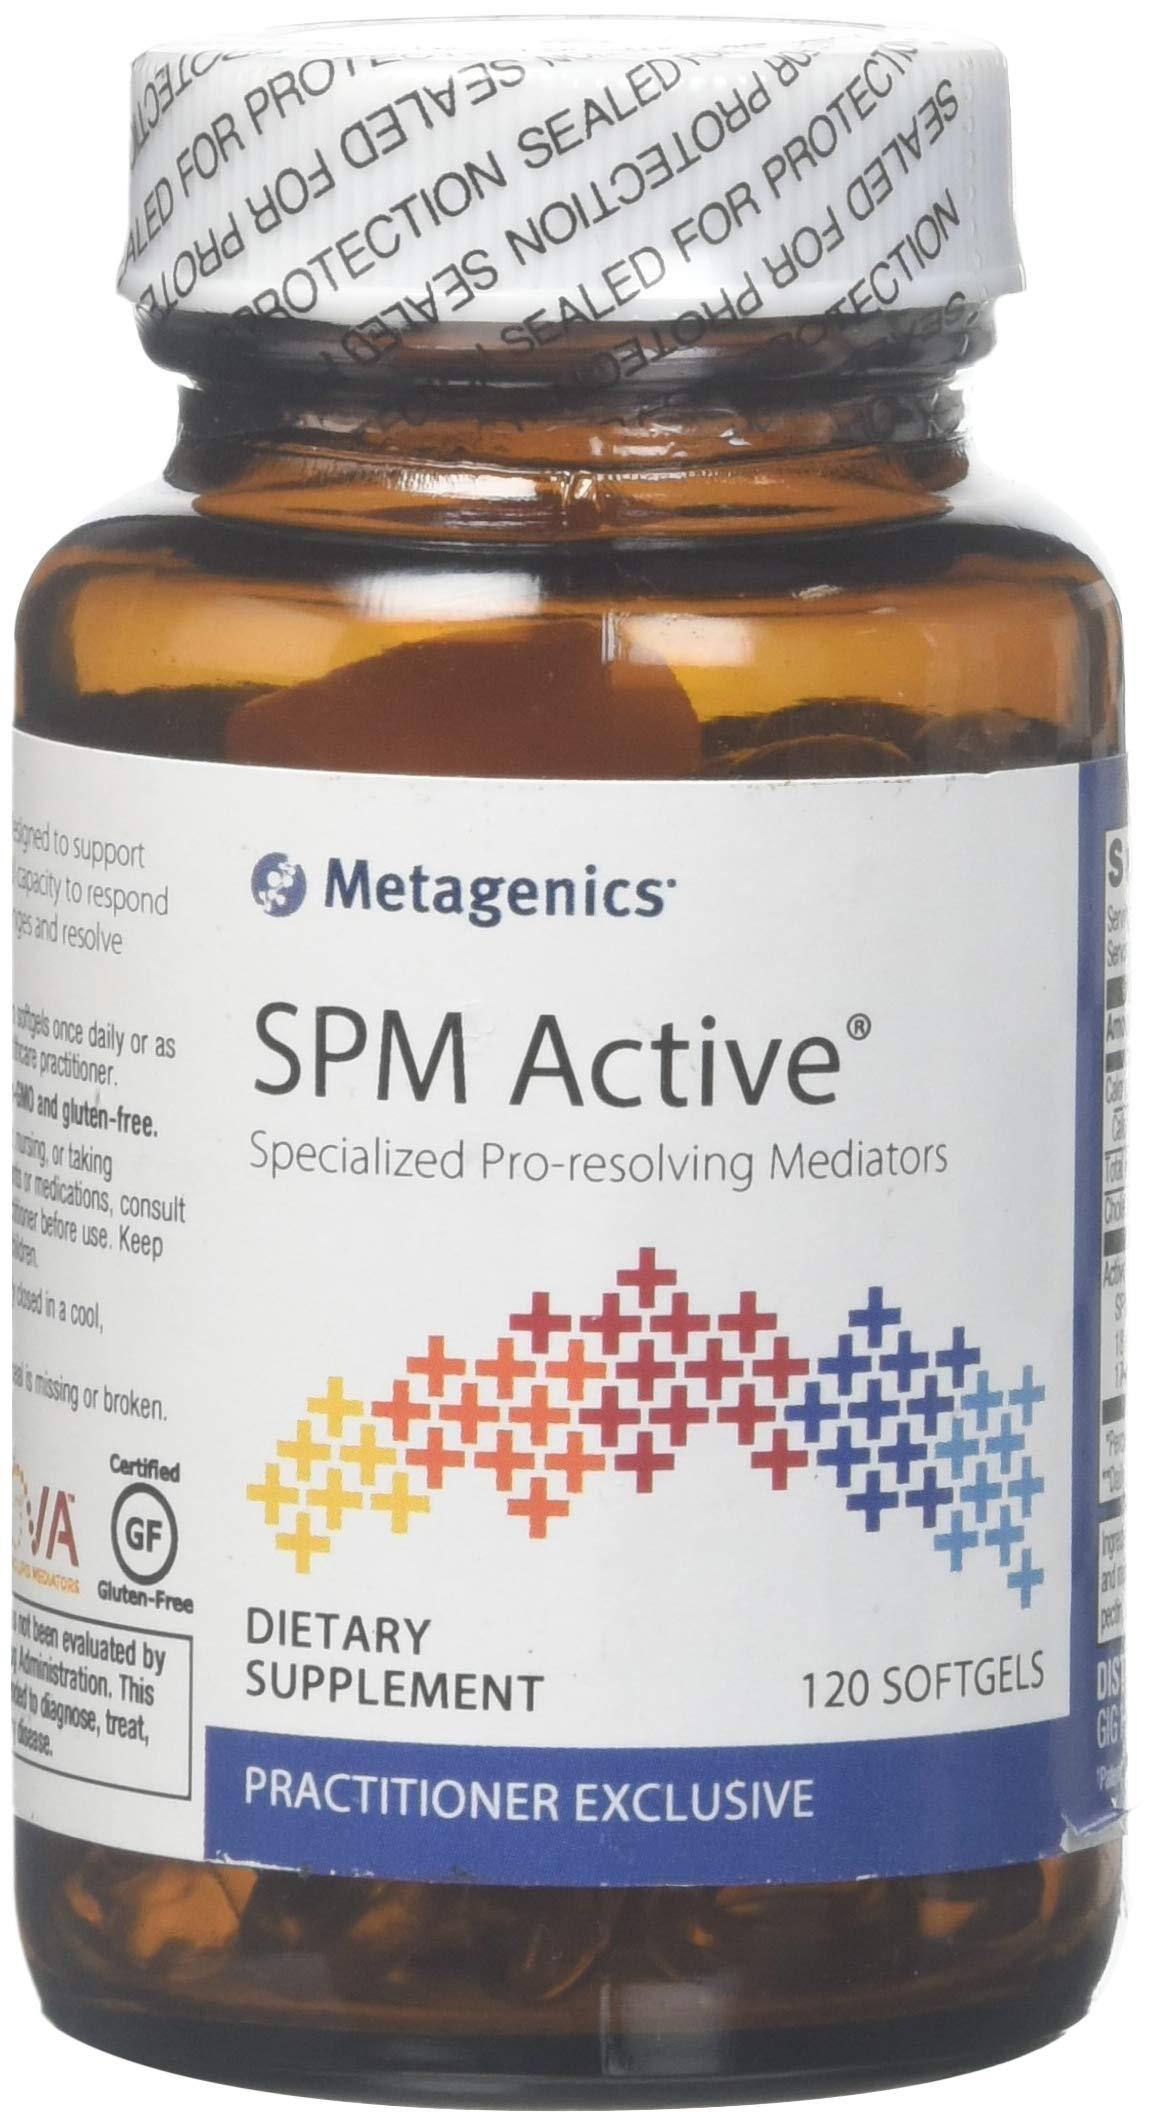 Metagenics - SPM Active, 120 Count